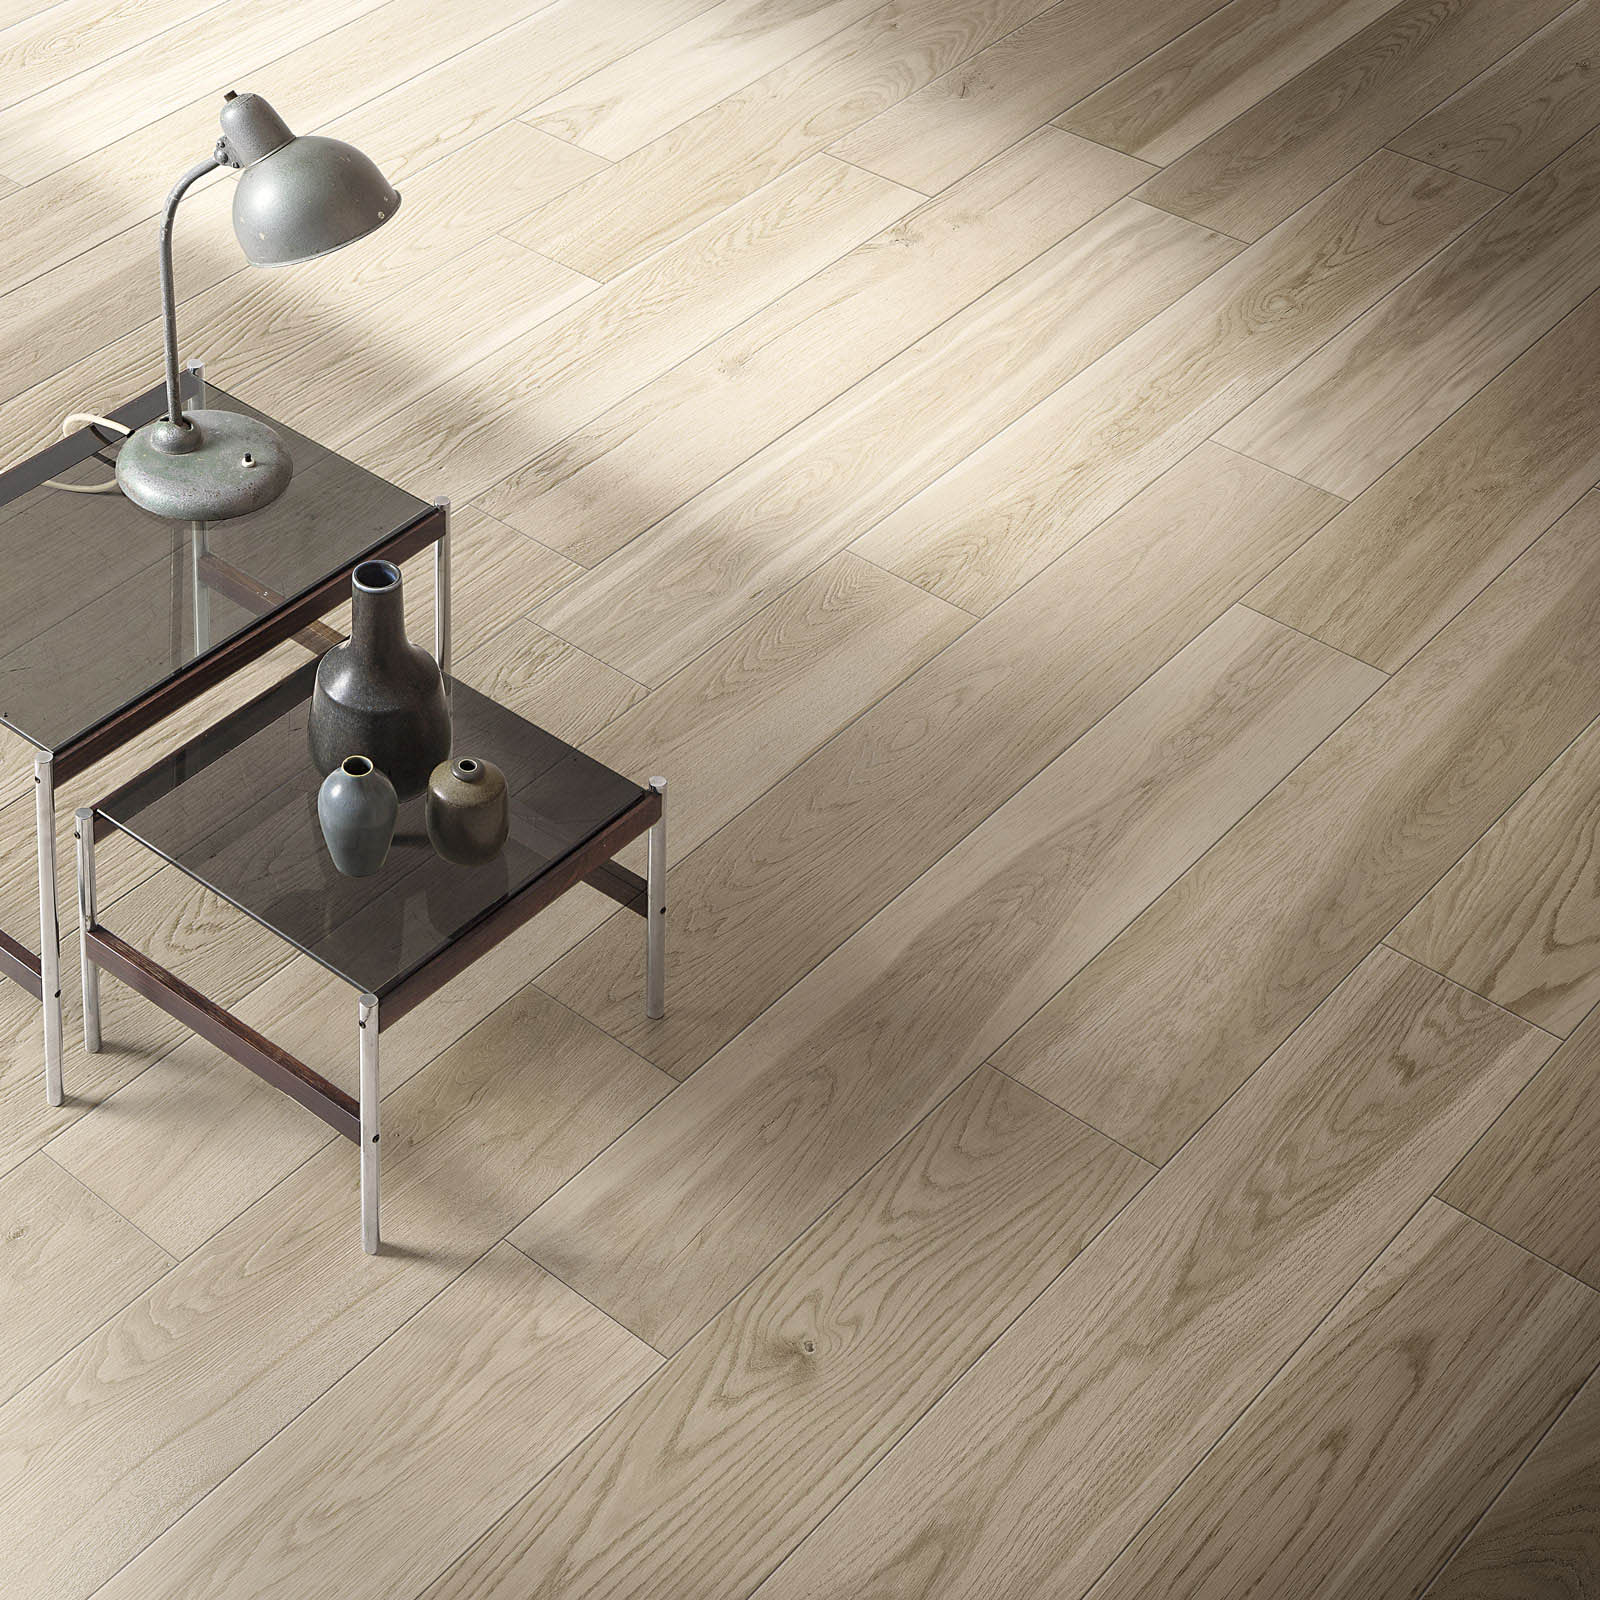 Baldosas suelo ideas para tu hogar marazzi - Baldosas para suelos ...